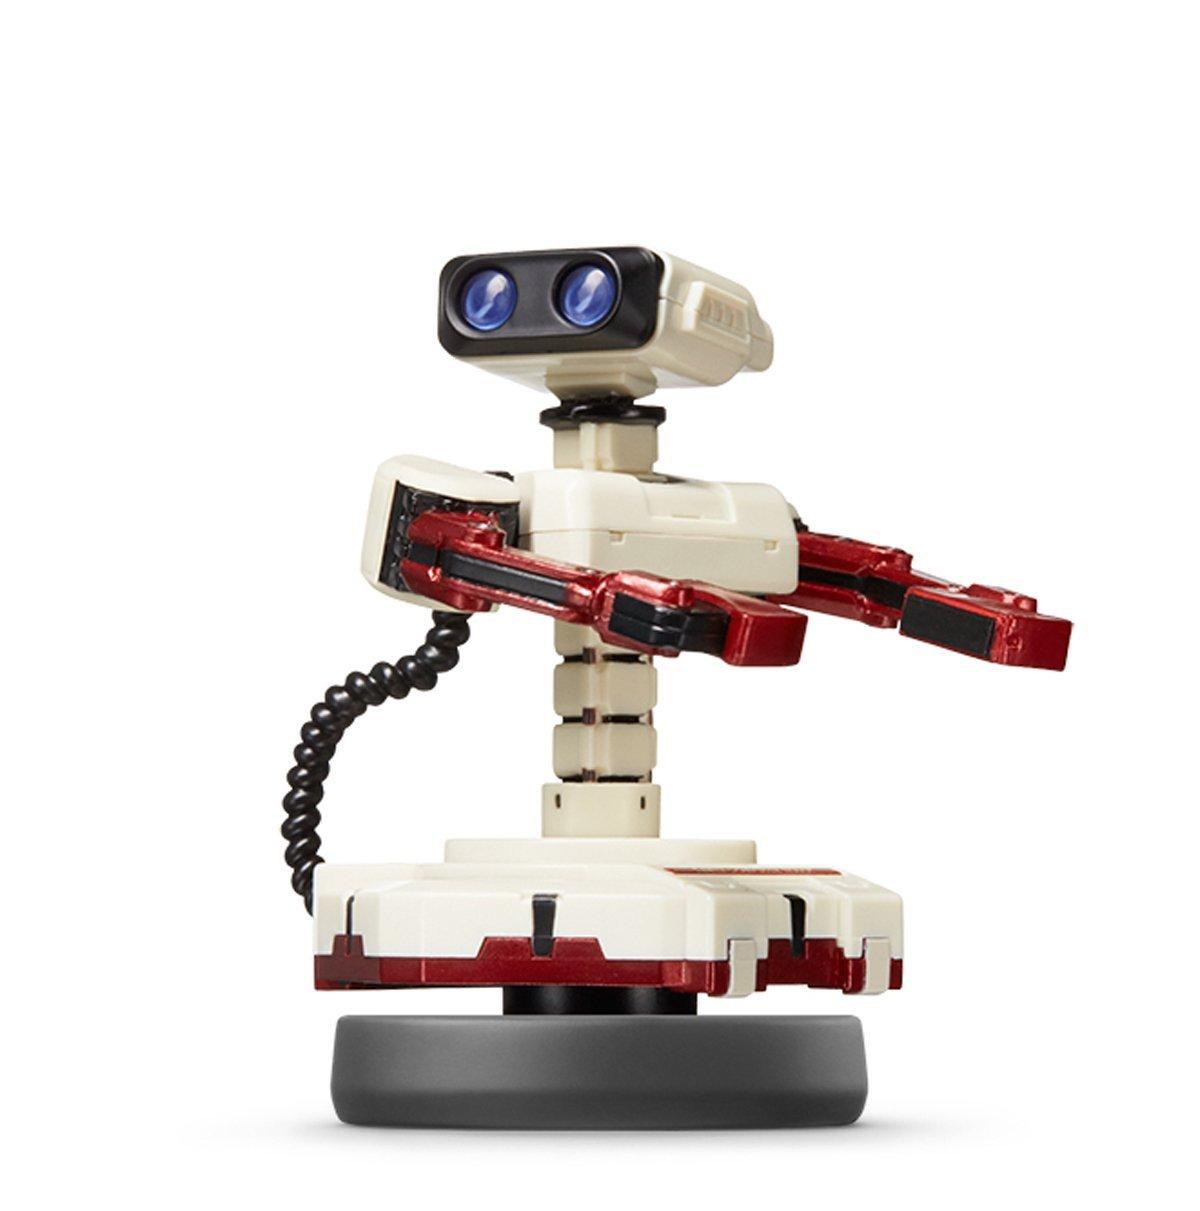 Amiibo 機器人 Robot 互動 Wii U/New3DS/New3DS LL 公仔 任天堂明星大亂鬥系列